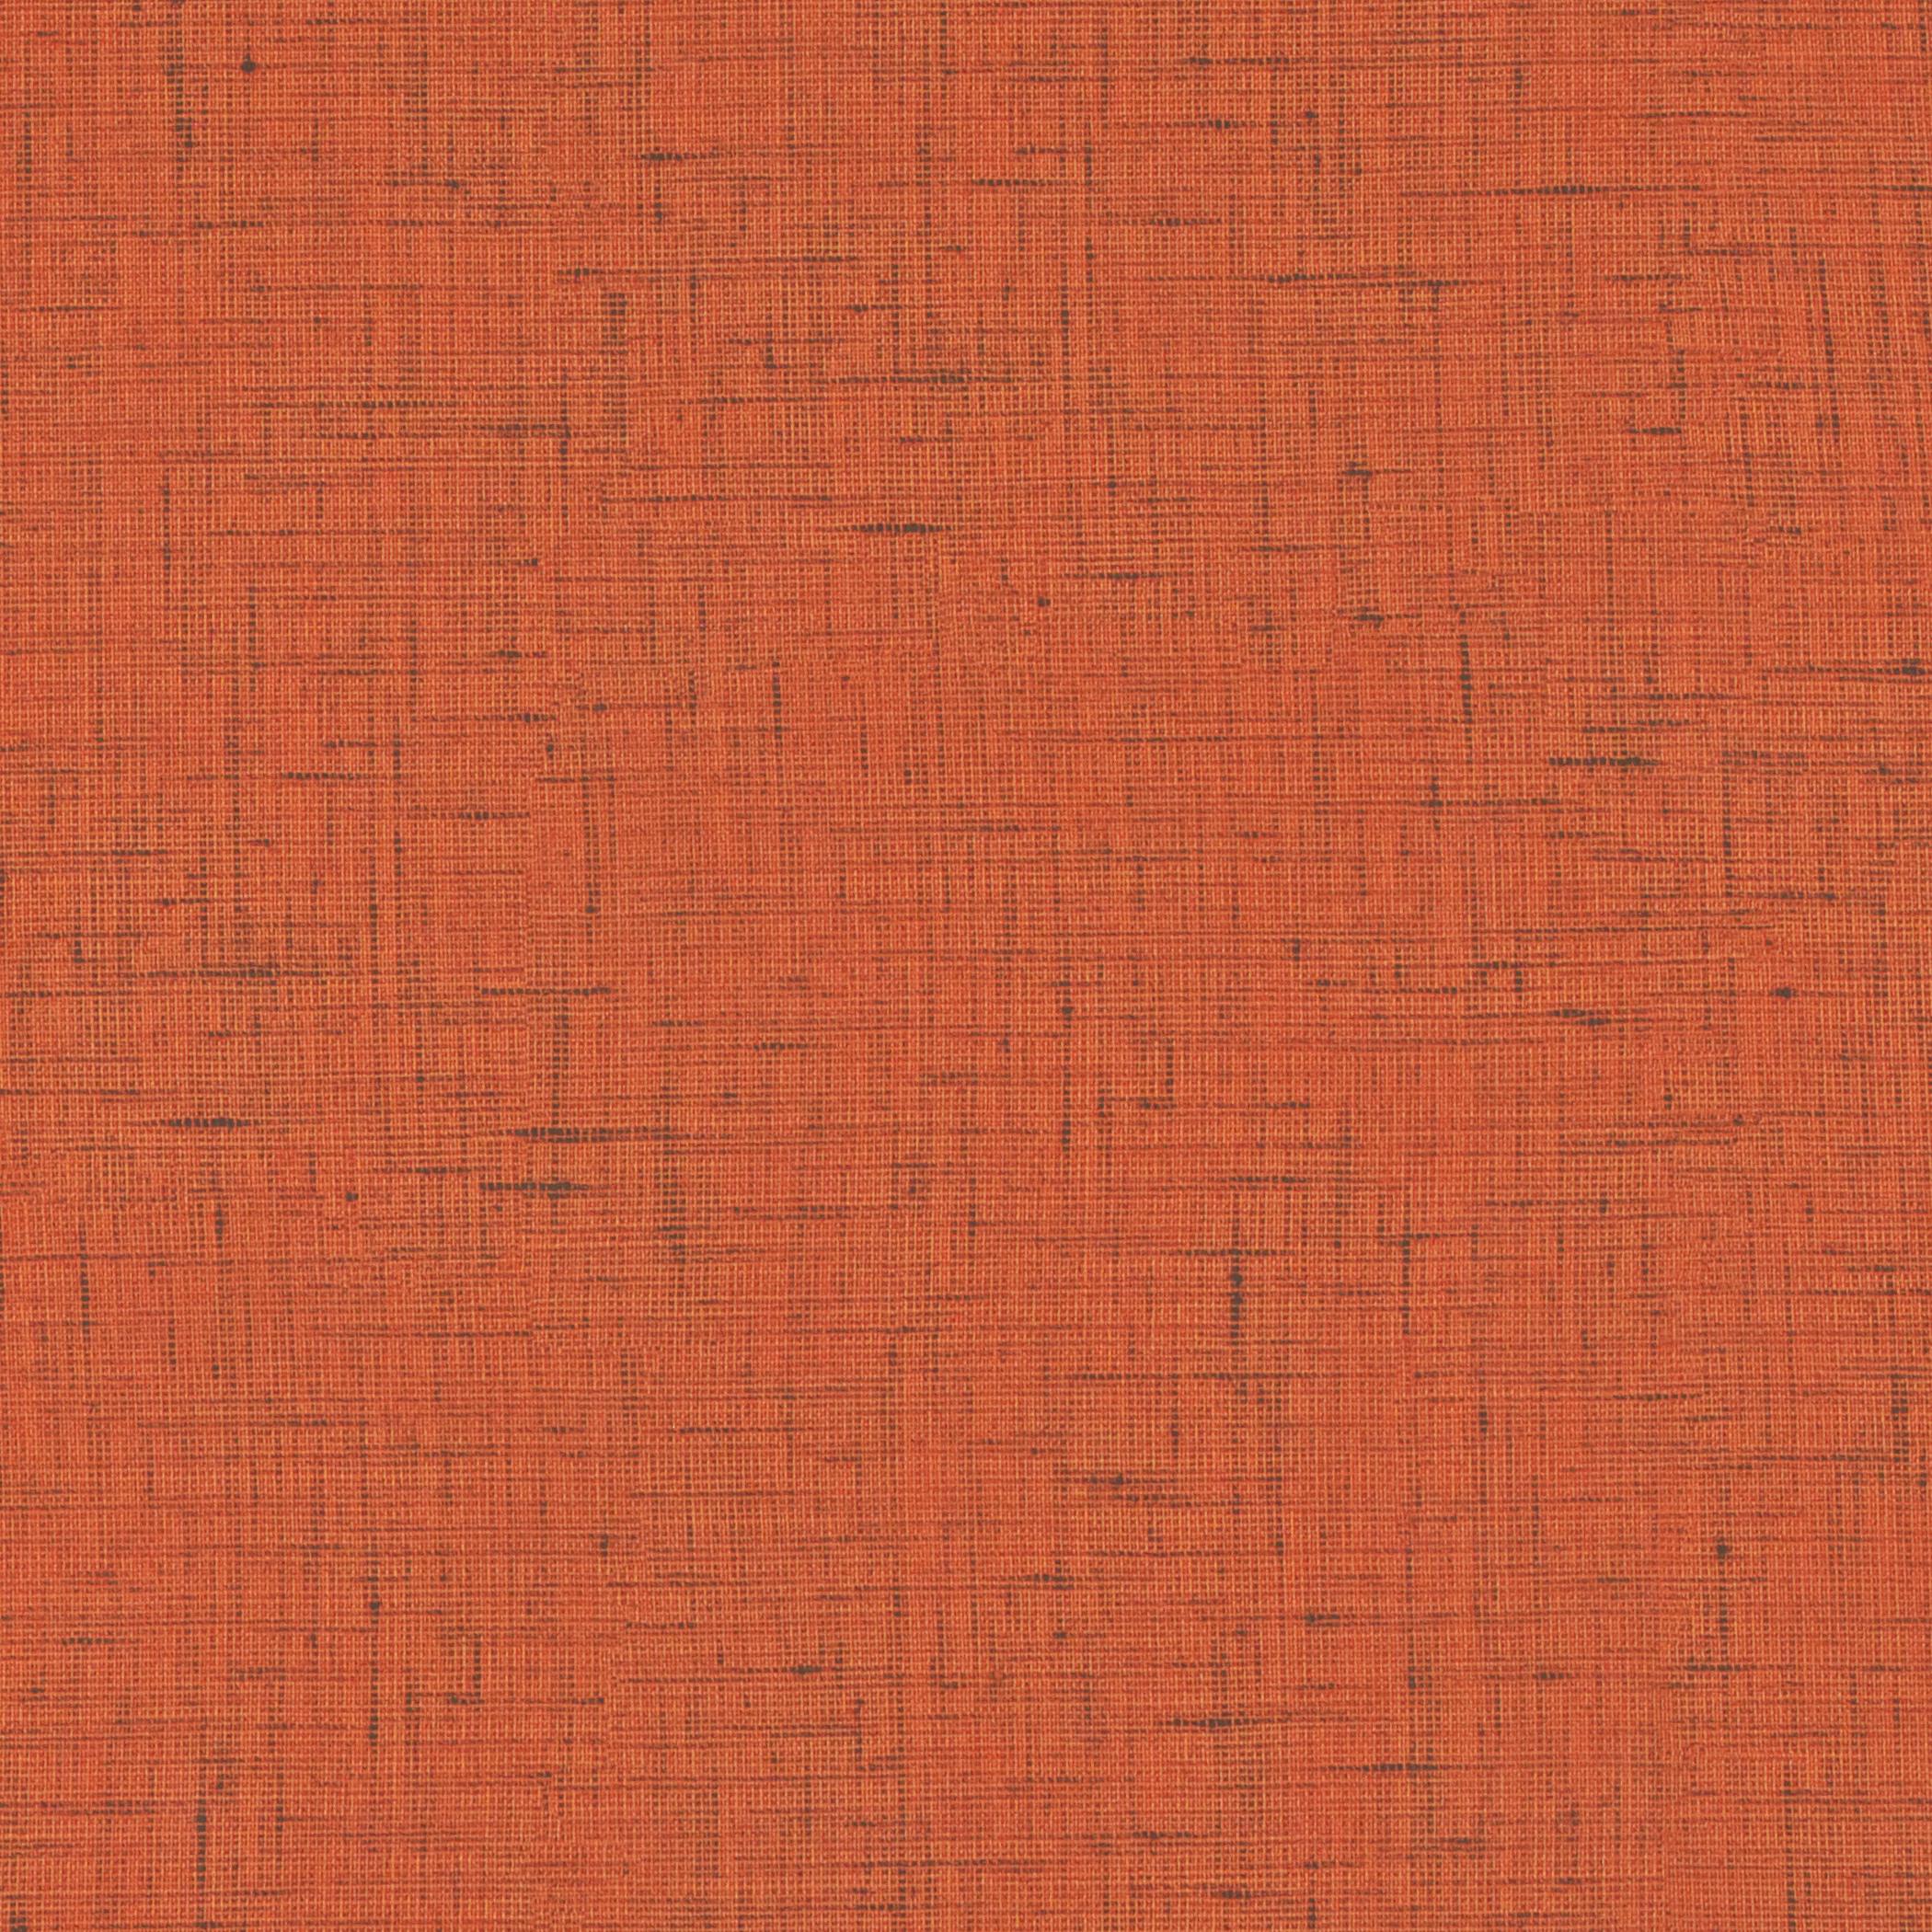 9490 Orange Lacquered Linen - Formica